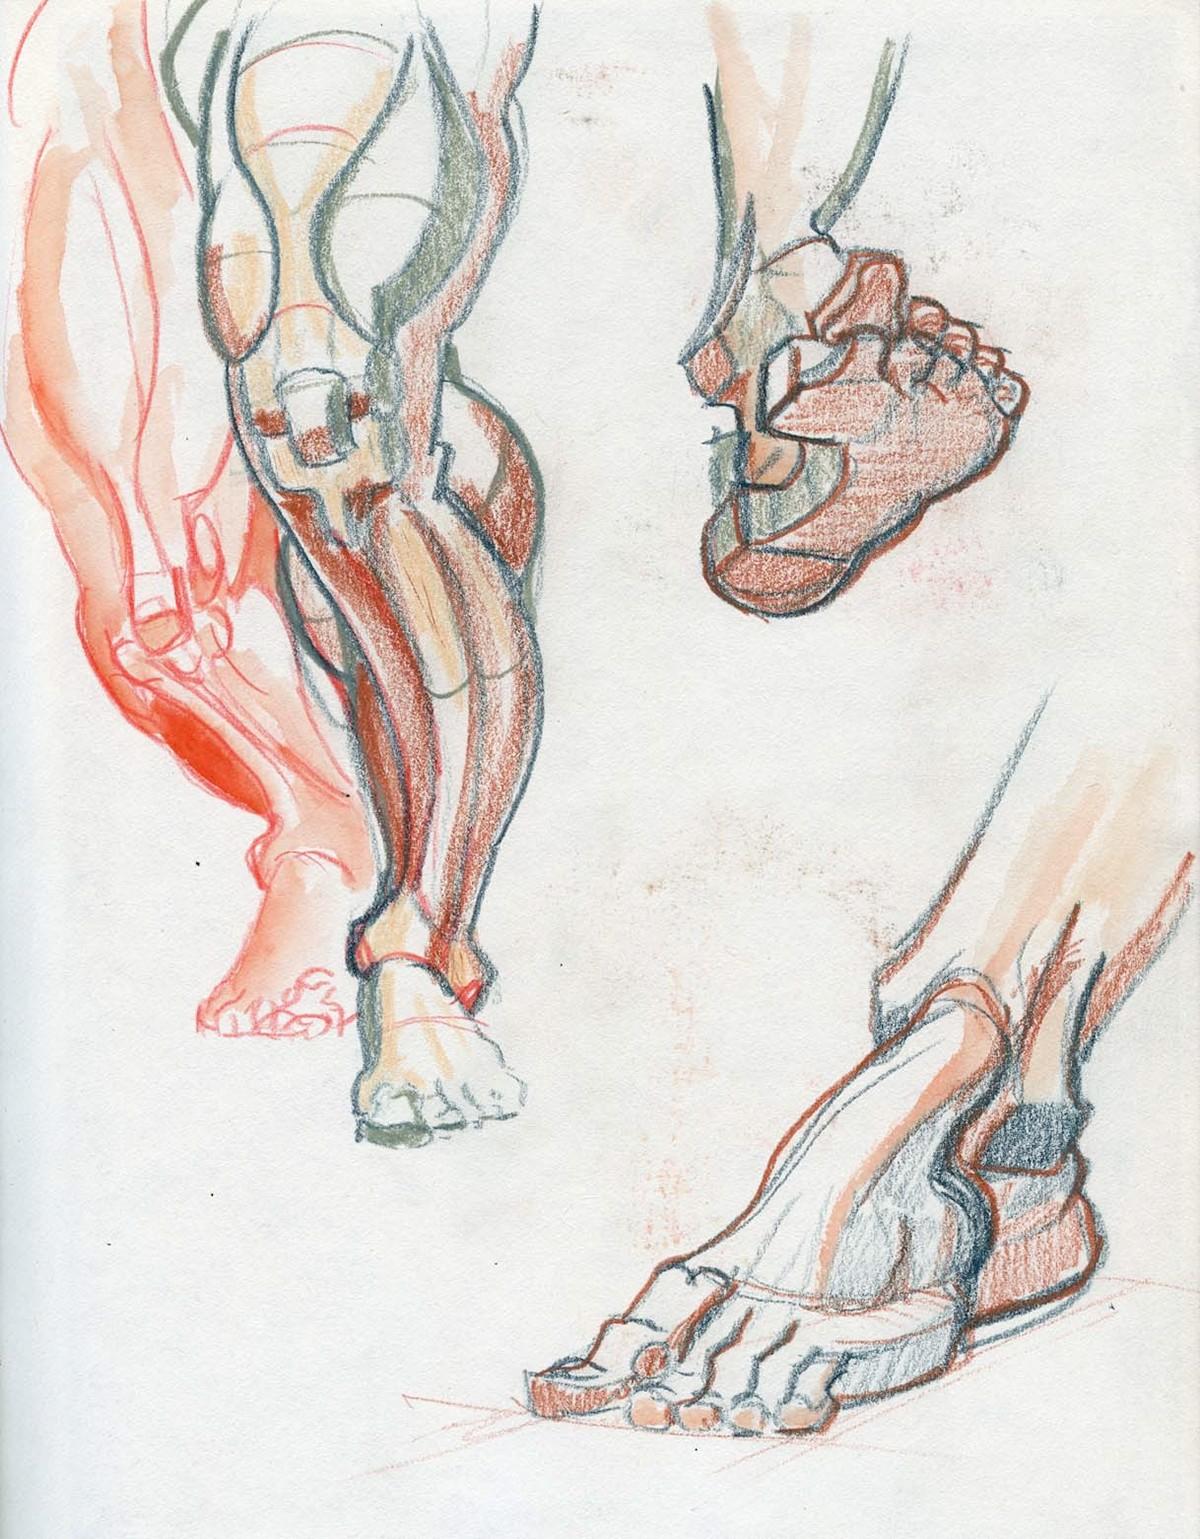 Anatomie Studien on Behance